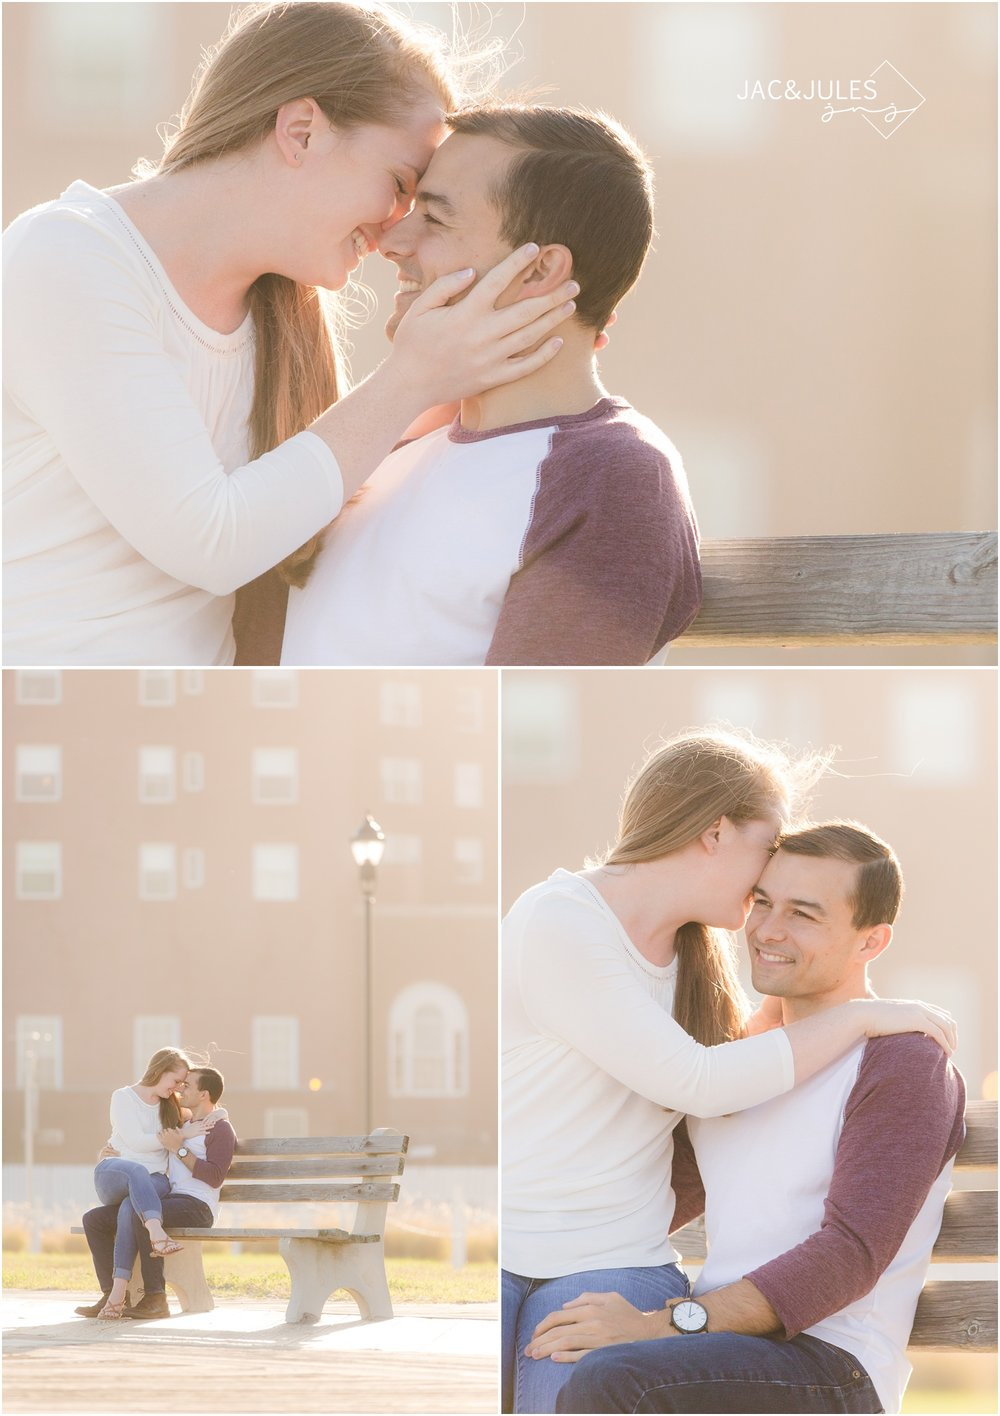 engagement photos at Asbury Park Boardwalk